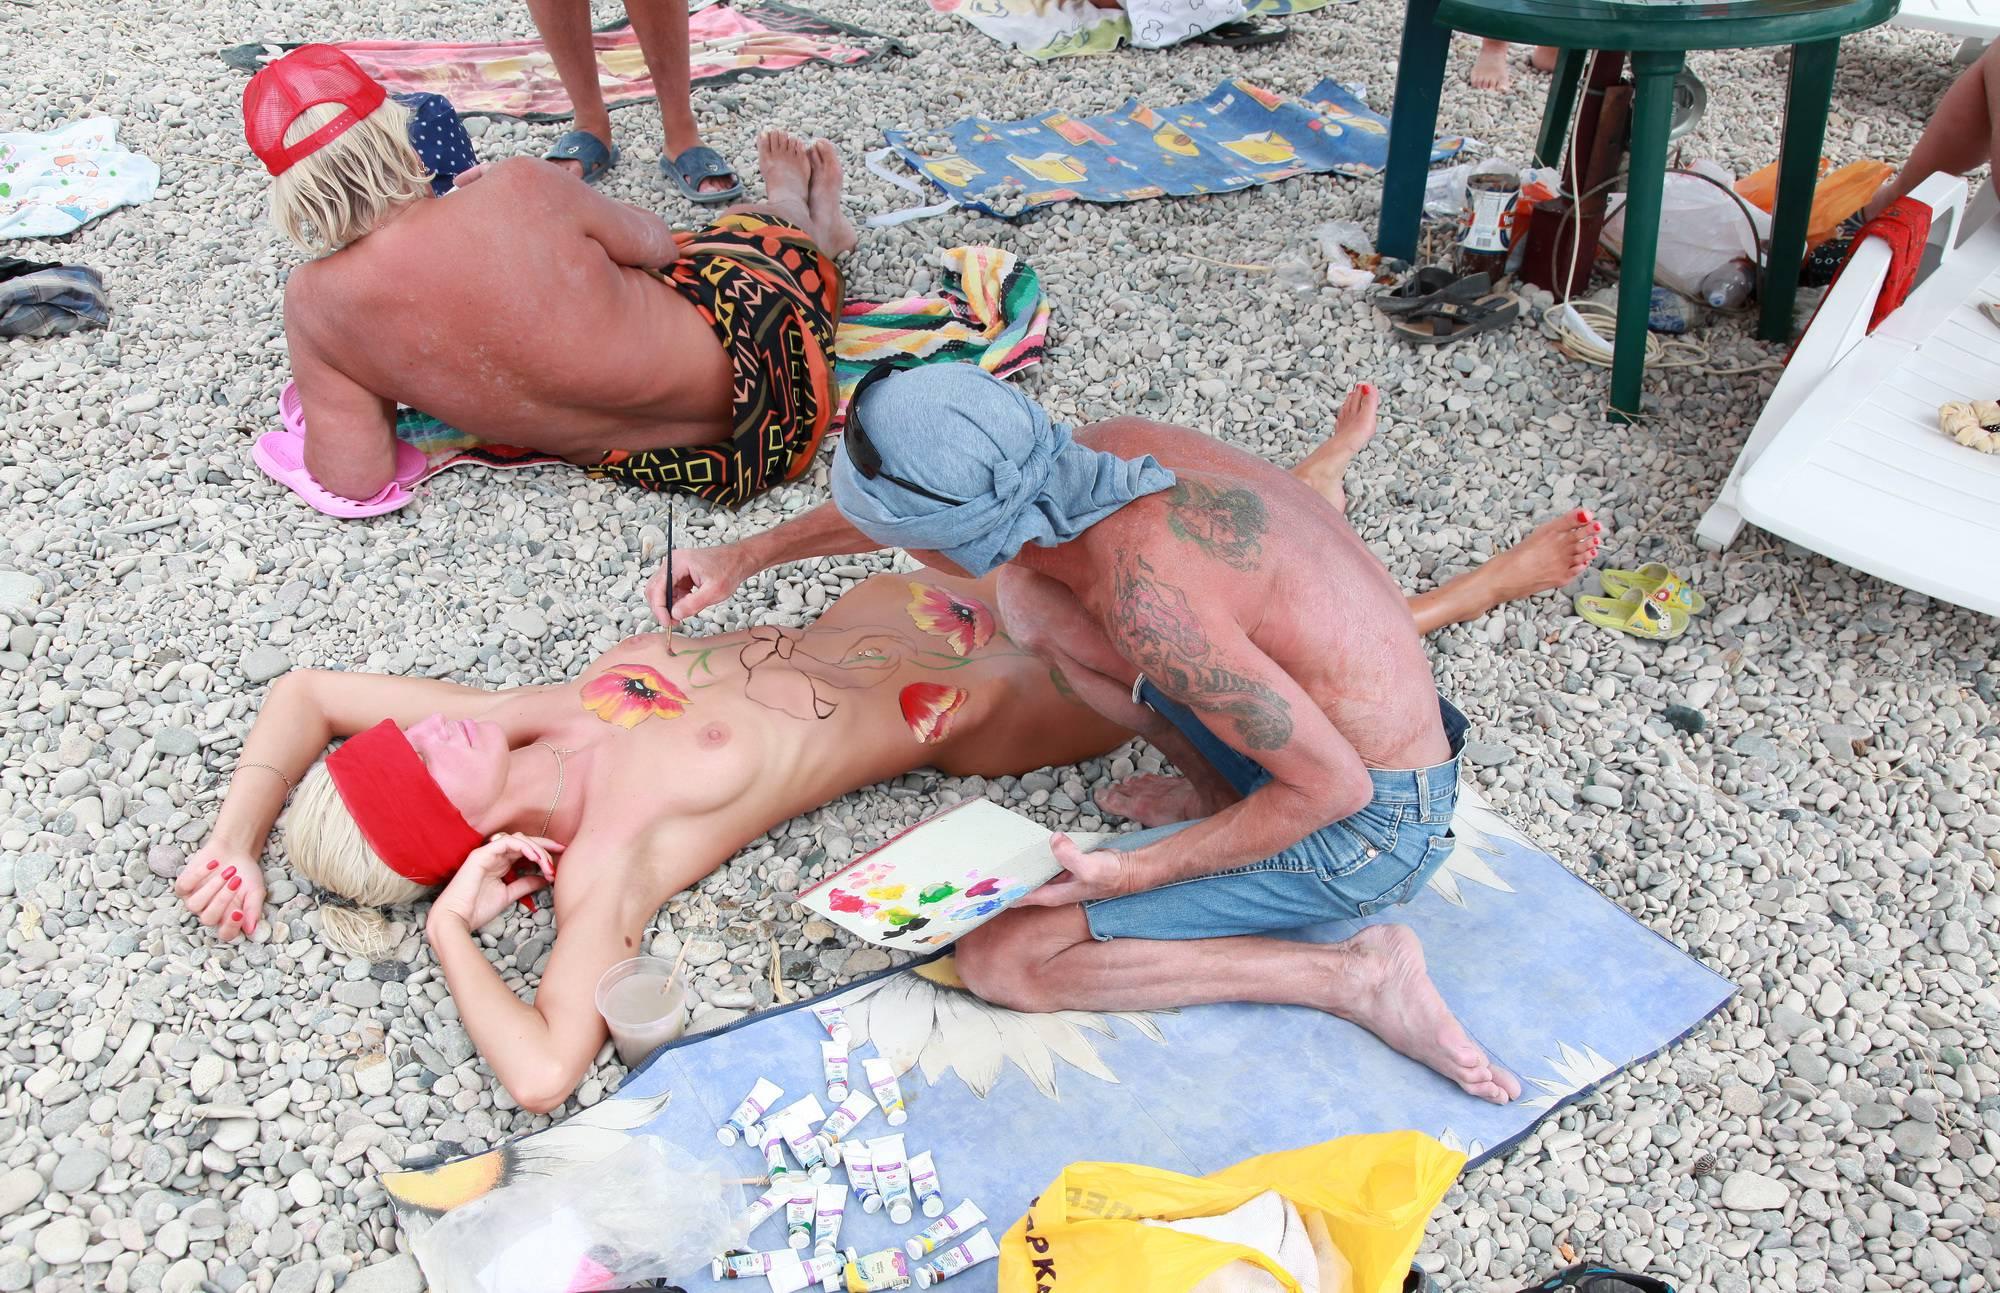 Nudist Gallery Neptune Ground Paintings - 2